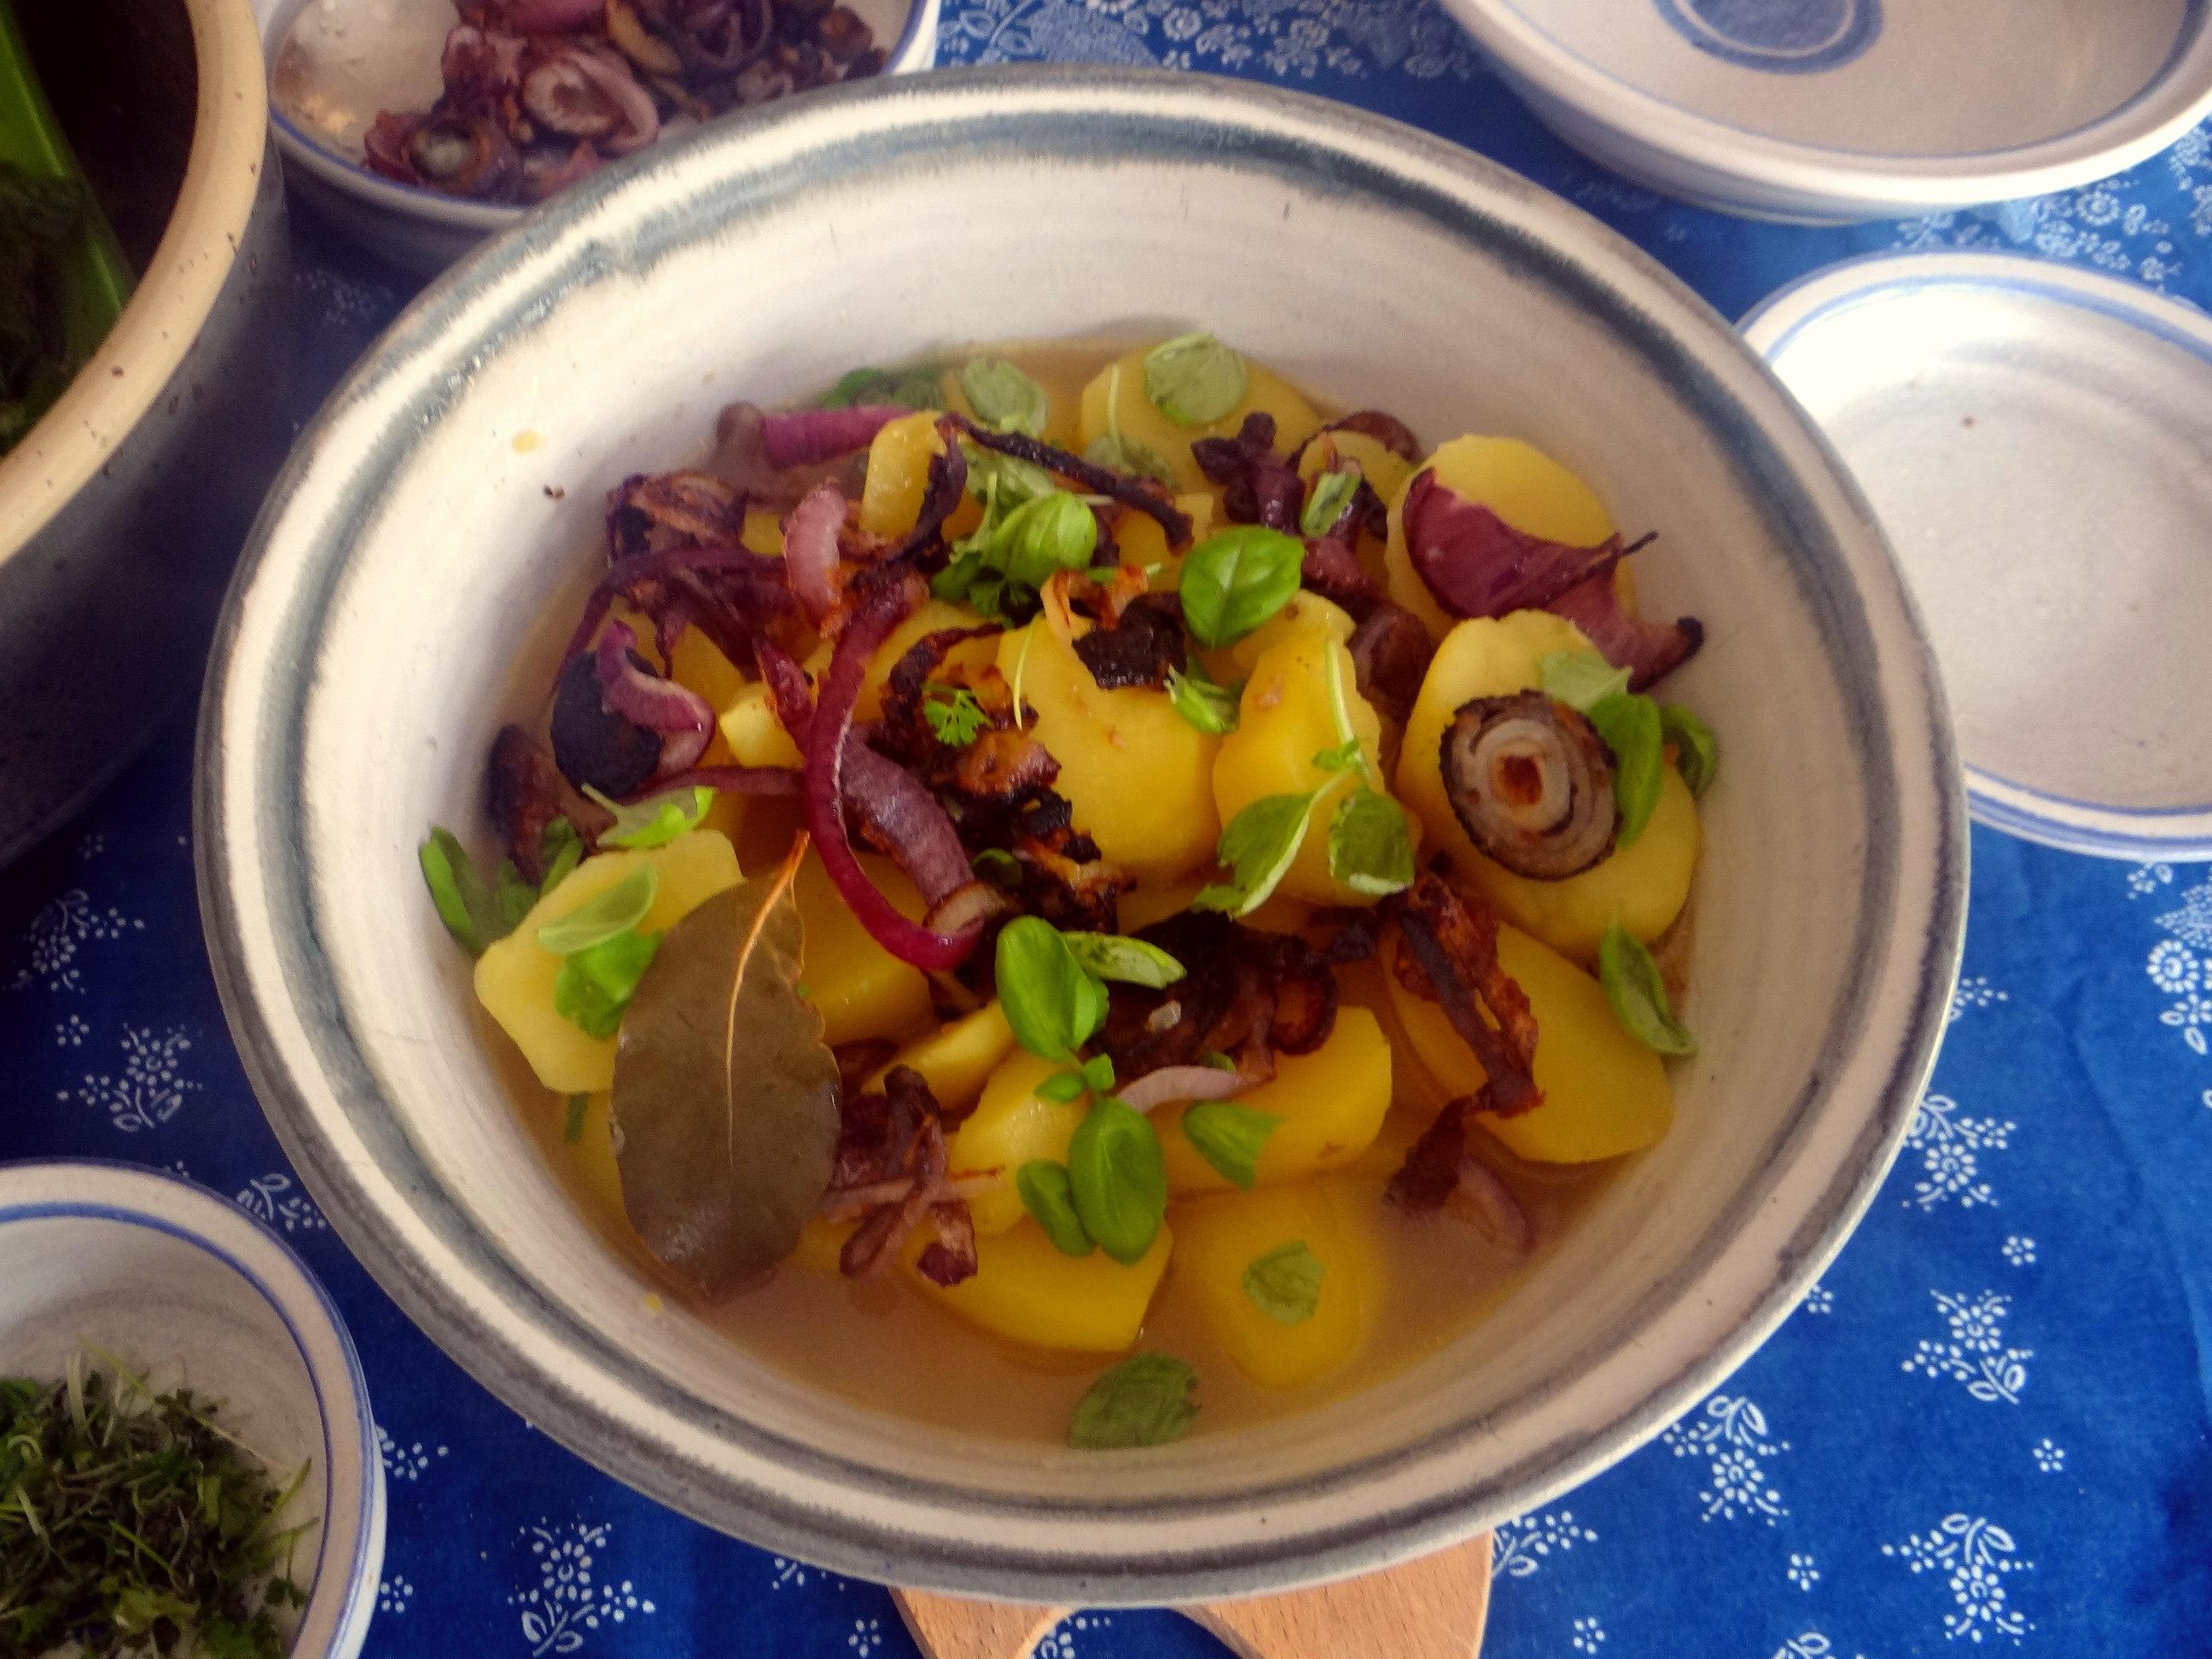 Bouillionkartoffeln, Feldsalat, Zwiebelringe, Kleines Gemüse (14)